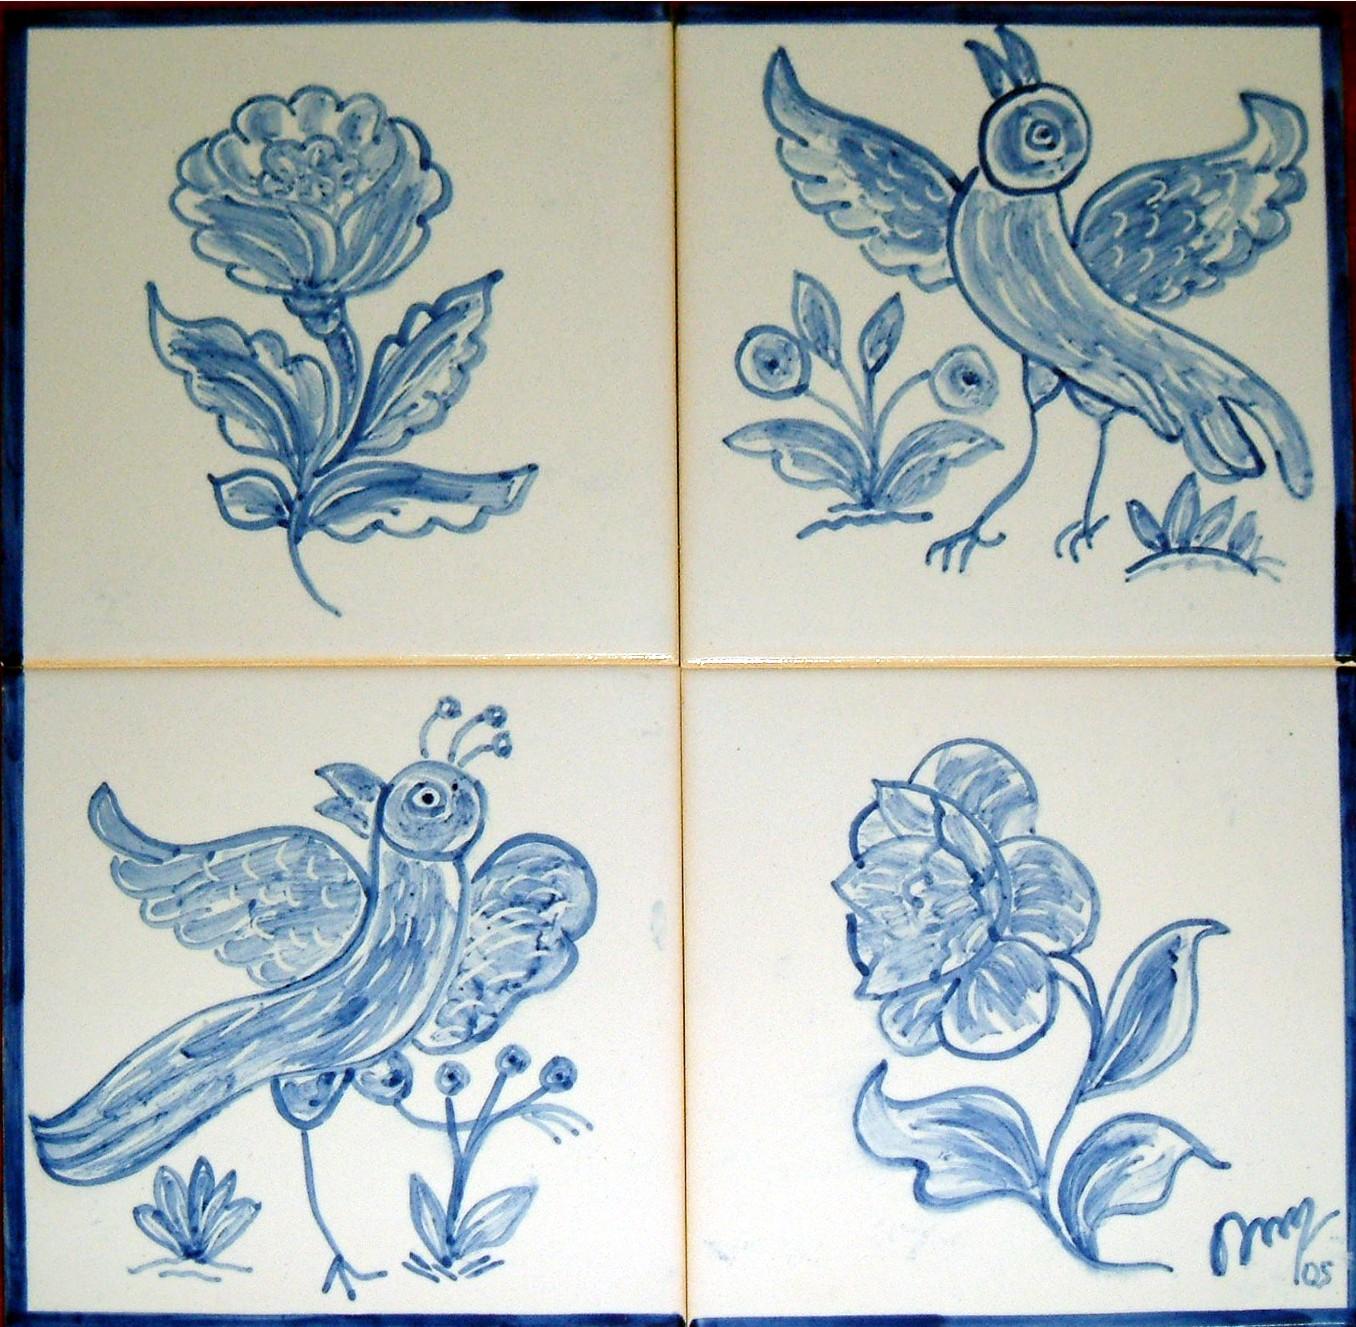 Pinturas de ana o 39 neill pintura de azulejos s culo xvii - Pintura de azulejos ...